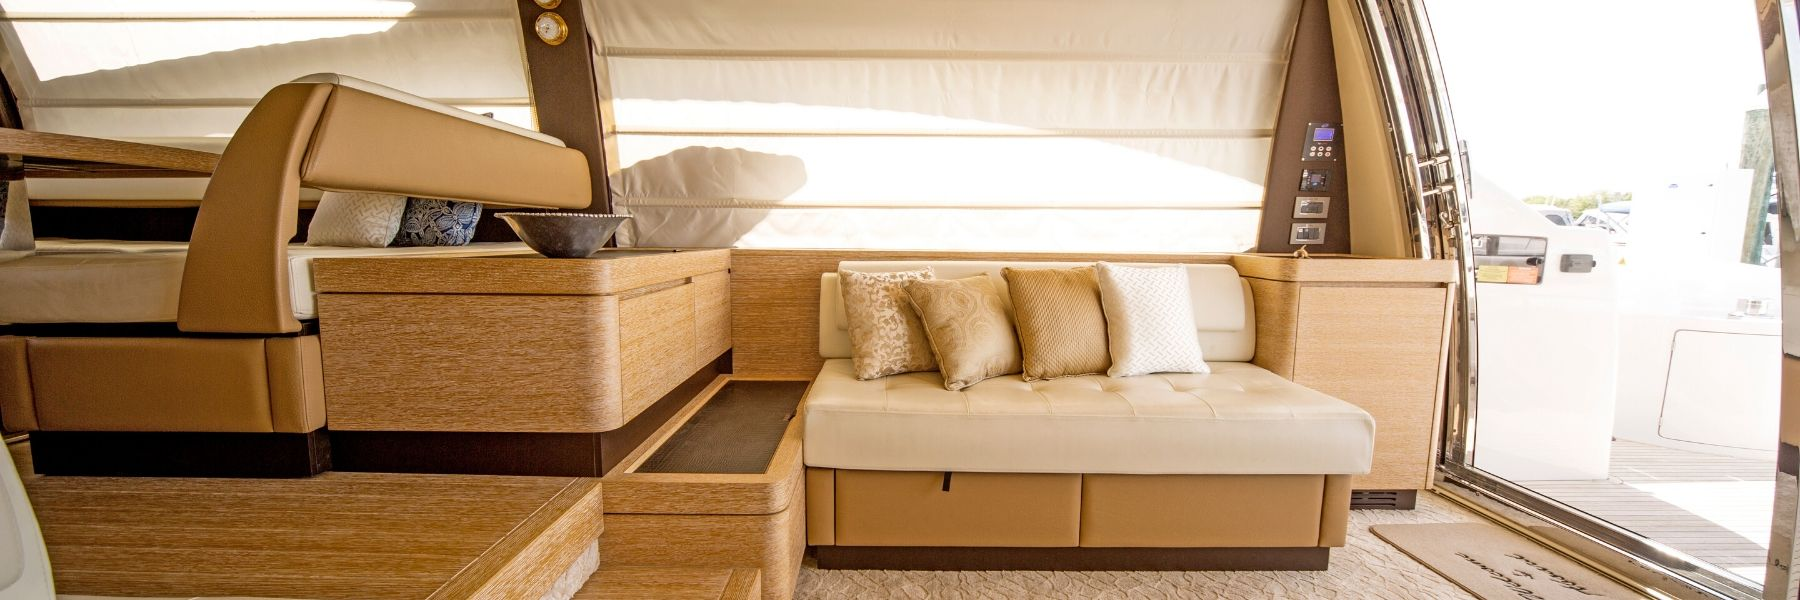 interior of yacht